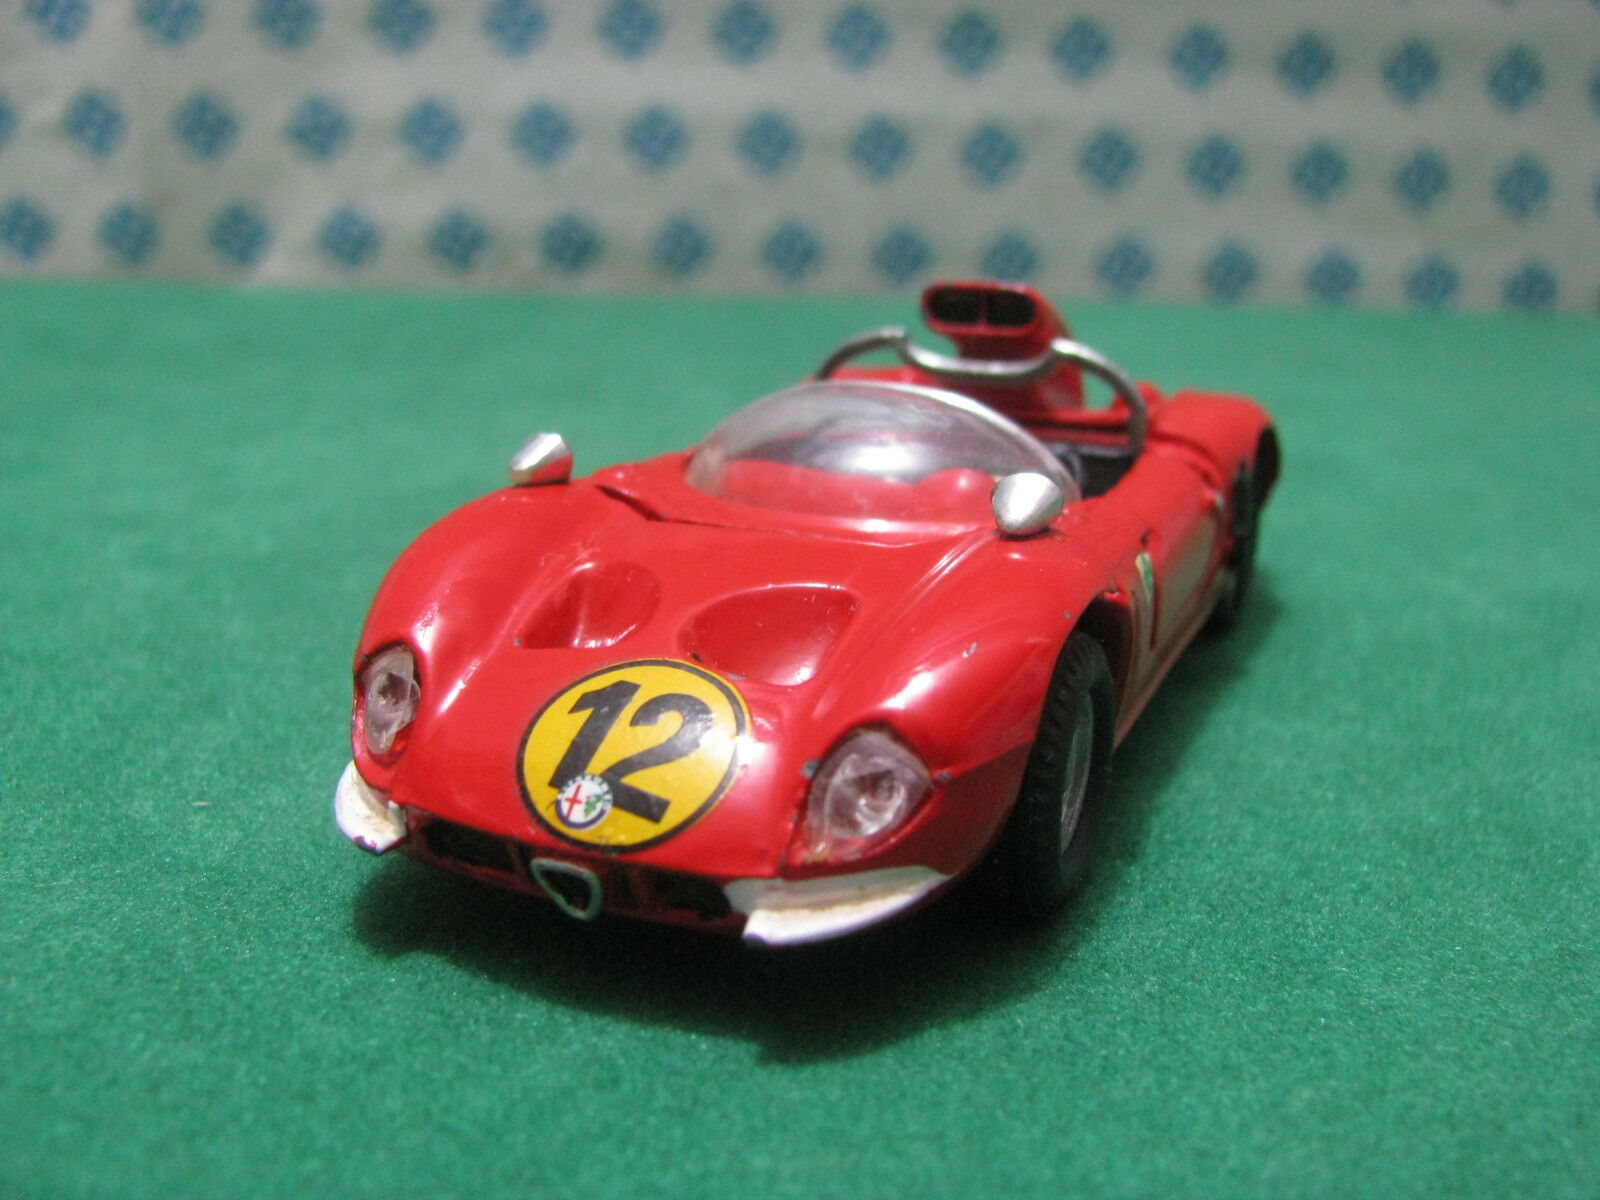 Vintage-Alfa Romeo 33 2 Araña 2000cc Sport - 1 43 Mercury Art.64